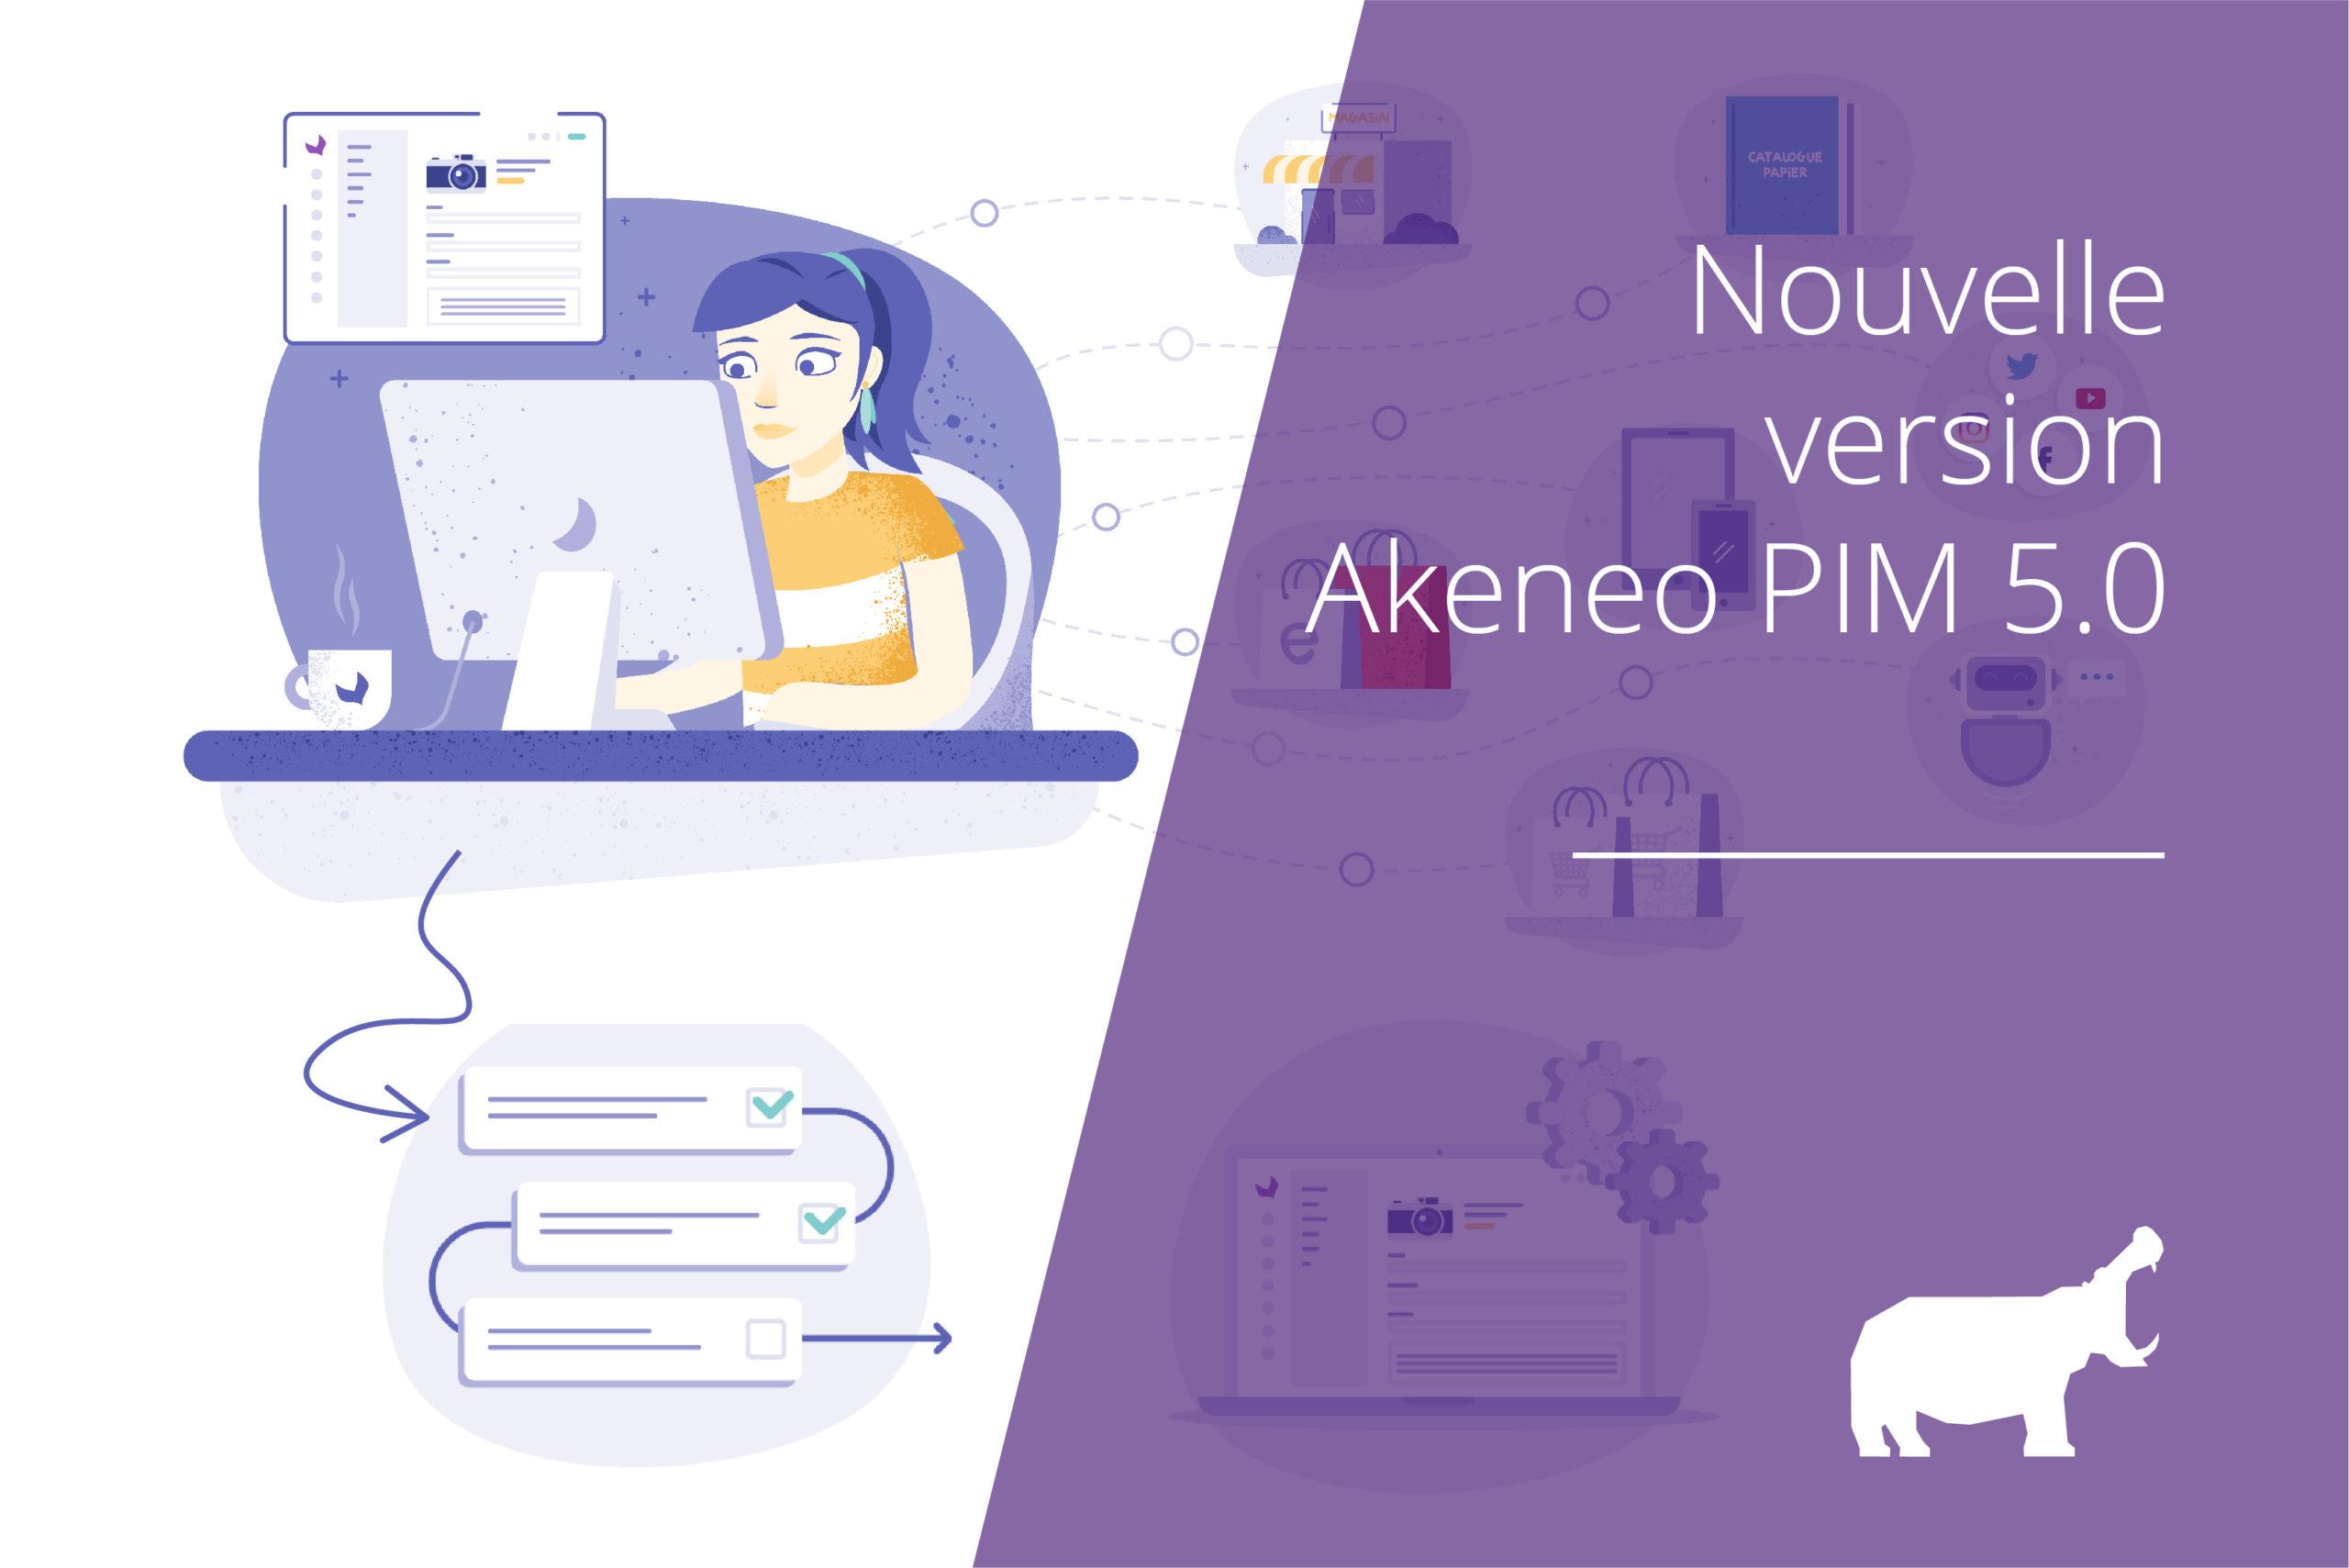 AkeneoPIM5.0